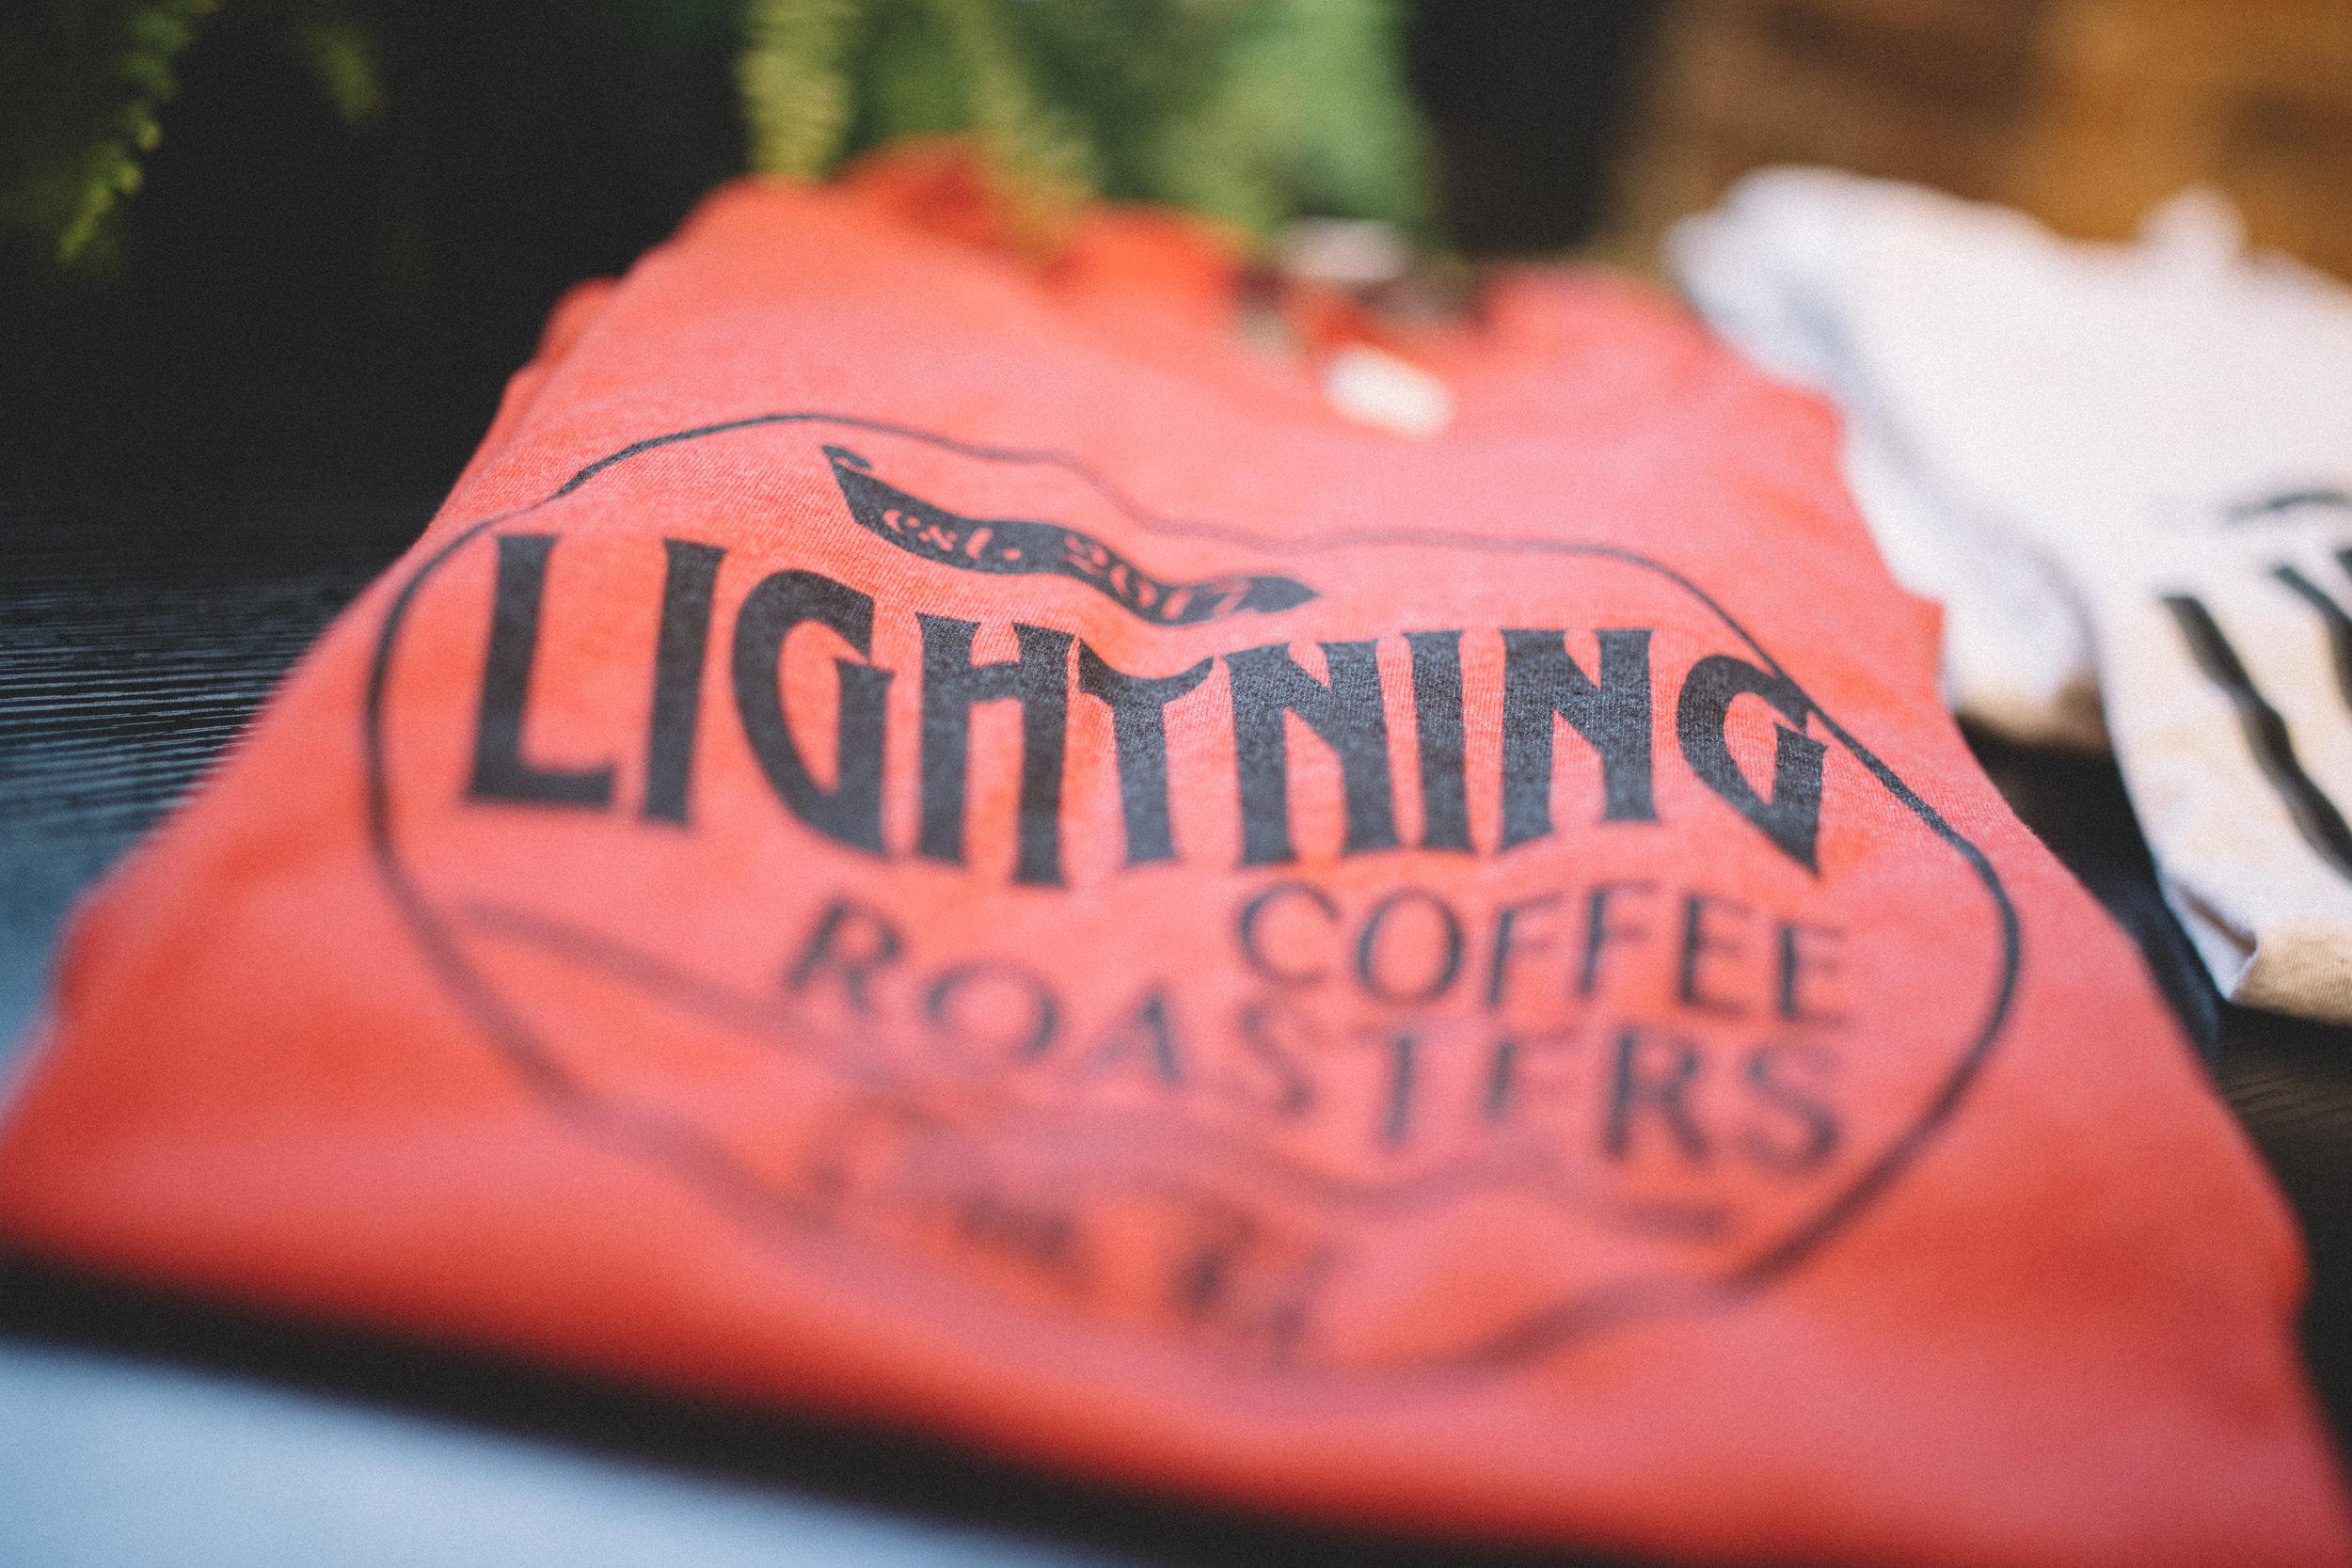 TPC-LightningRoasters-21.jpg